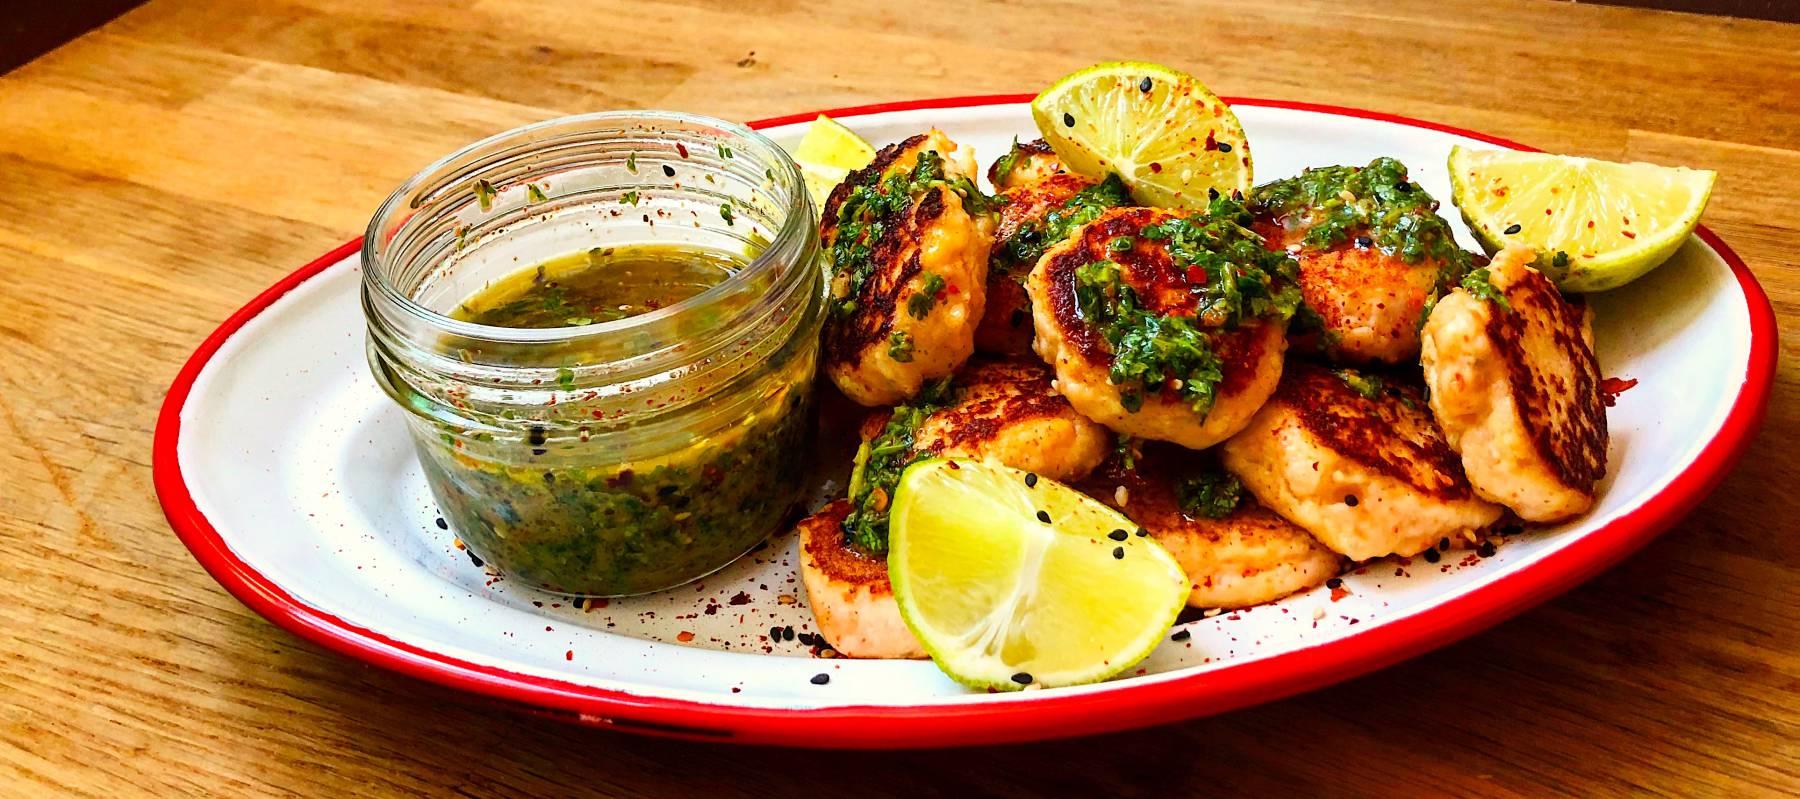 Bocaditos de langostino con sambal de cilantro